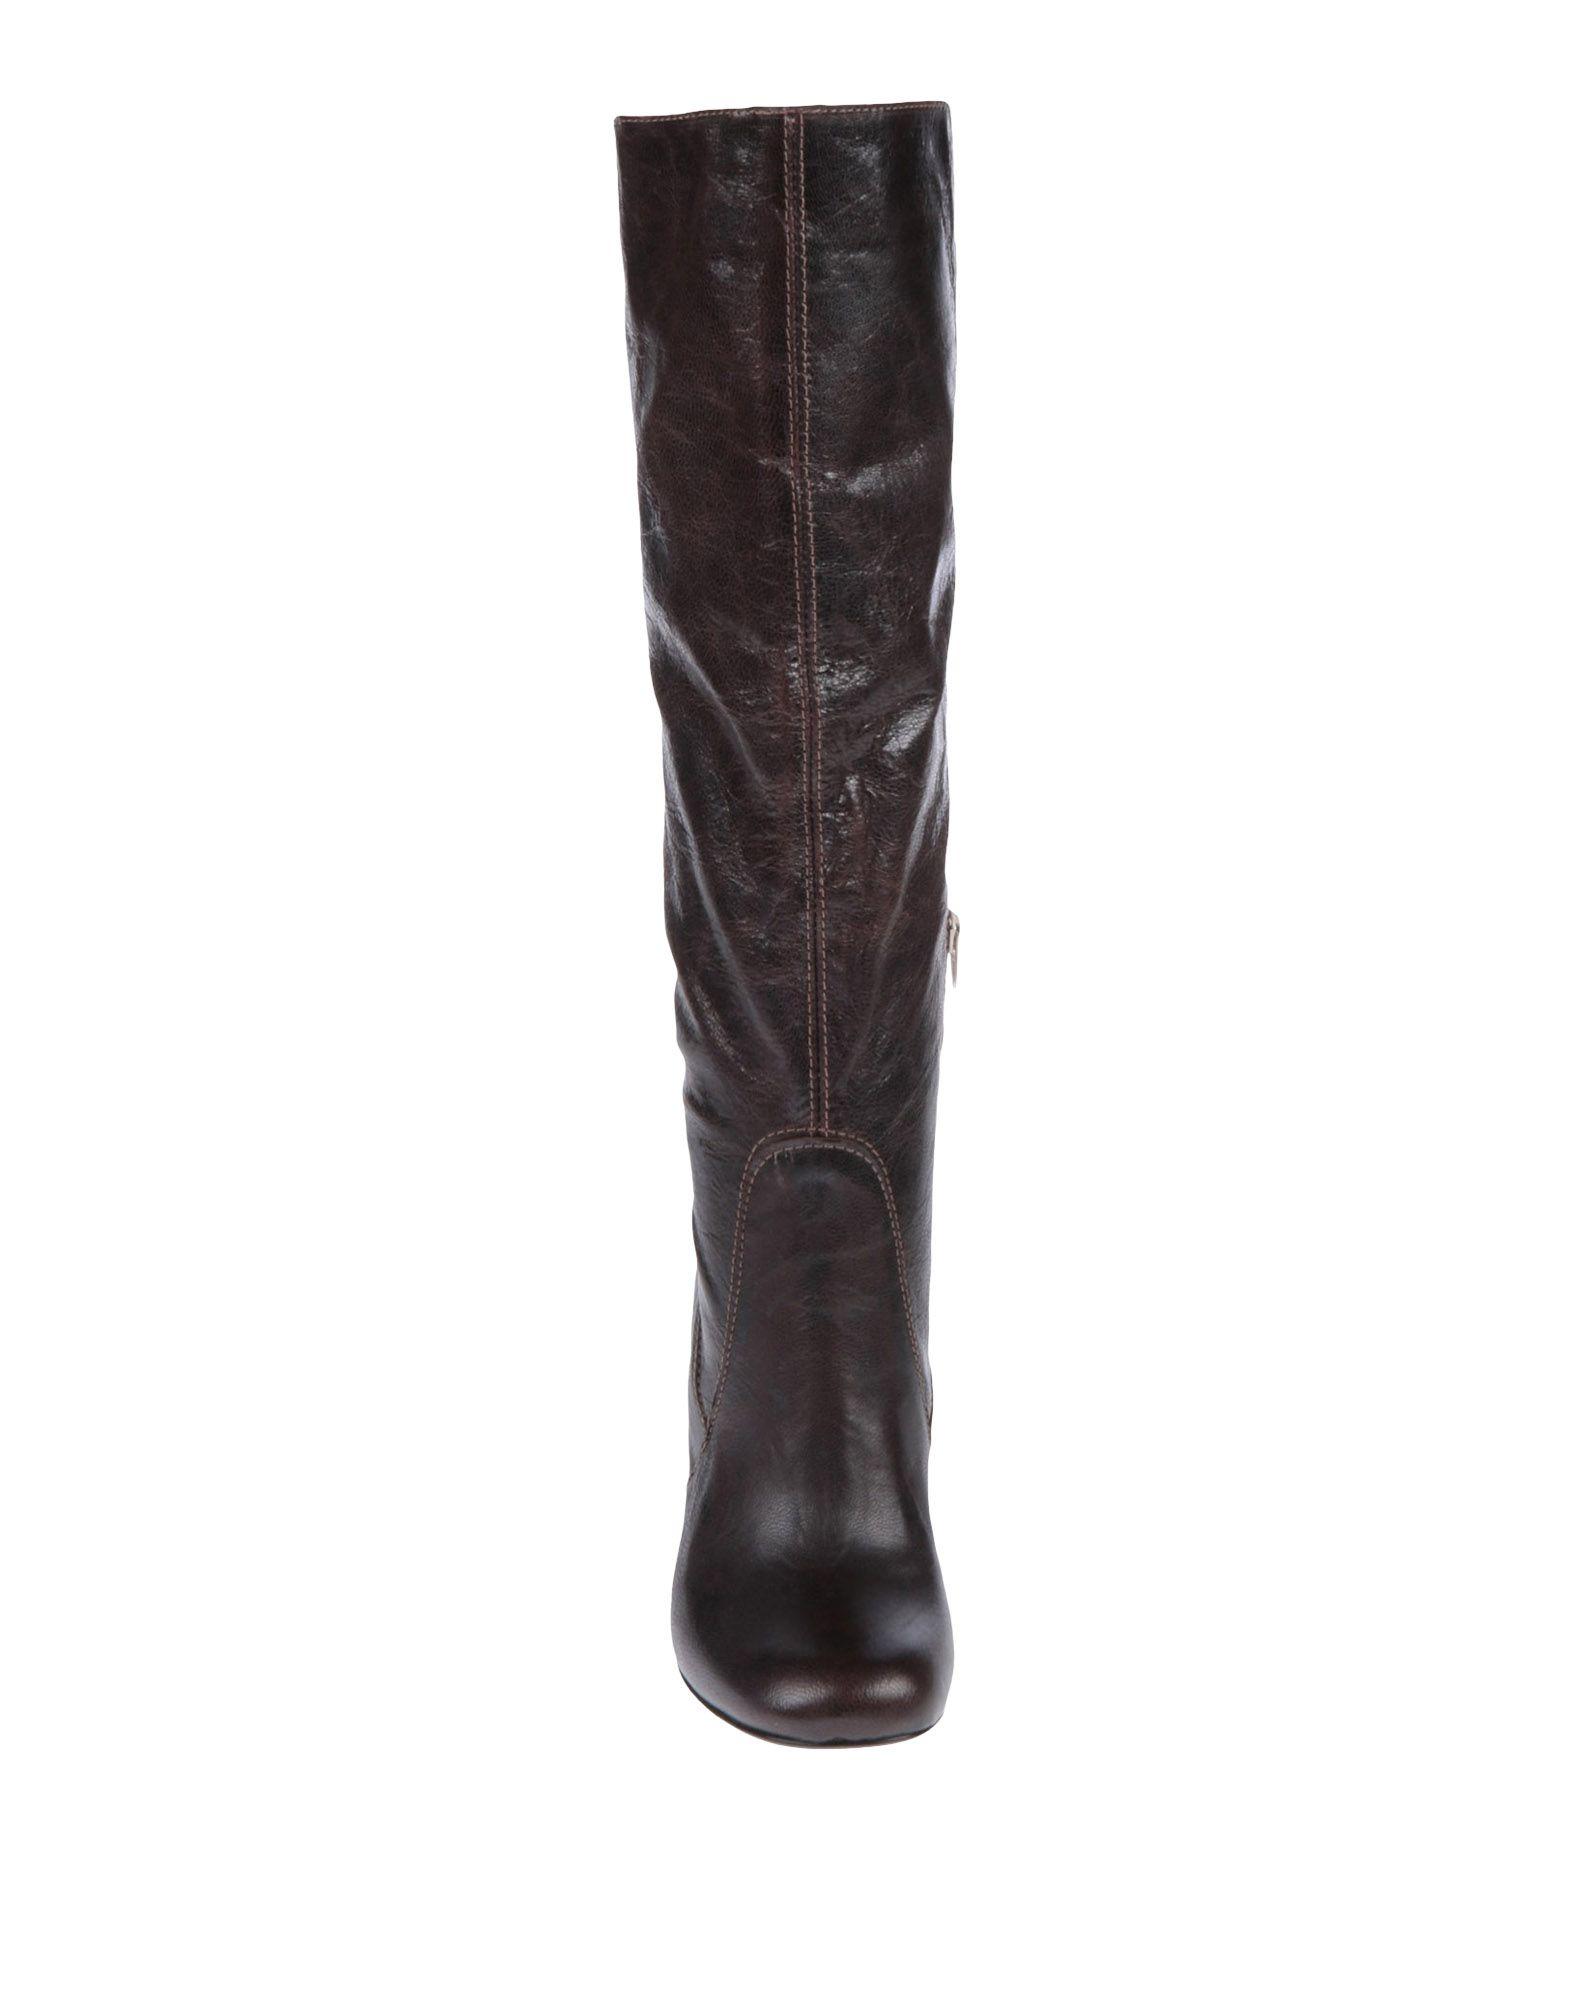 Unlace Stiefel Damen Damen Stiefel  11522780GU Heiße Schuhe c8250b